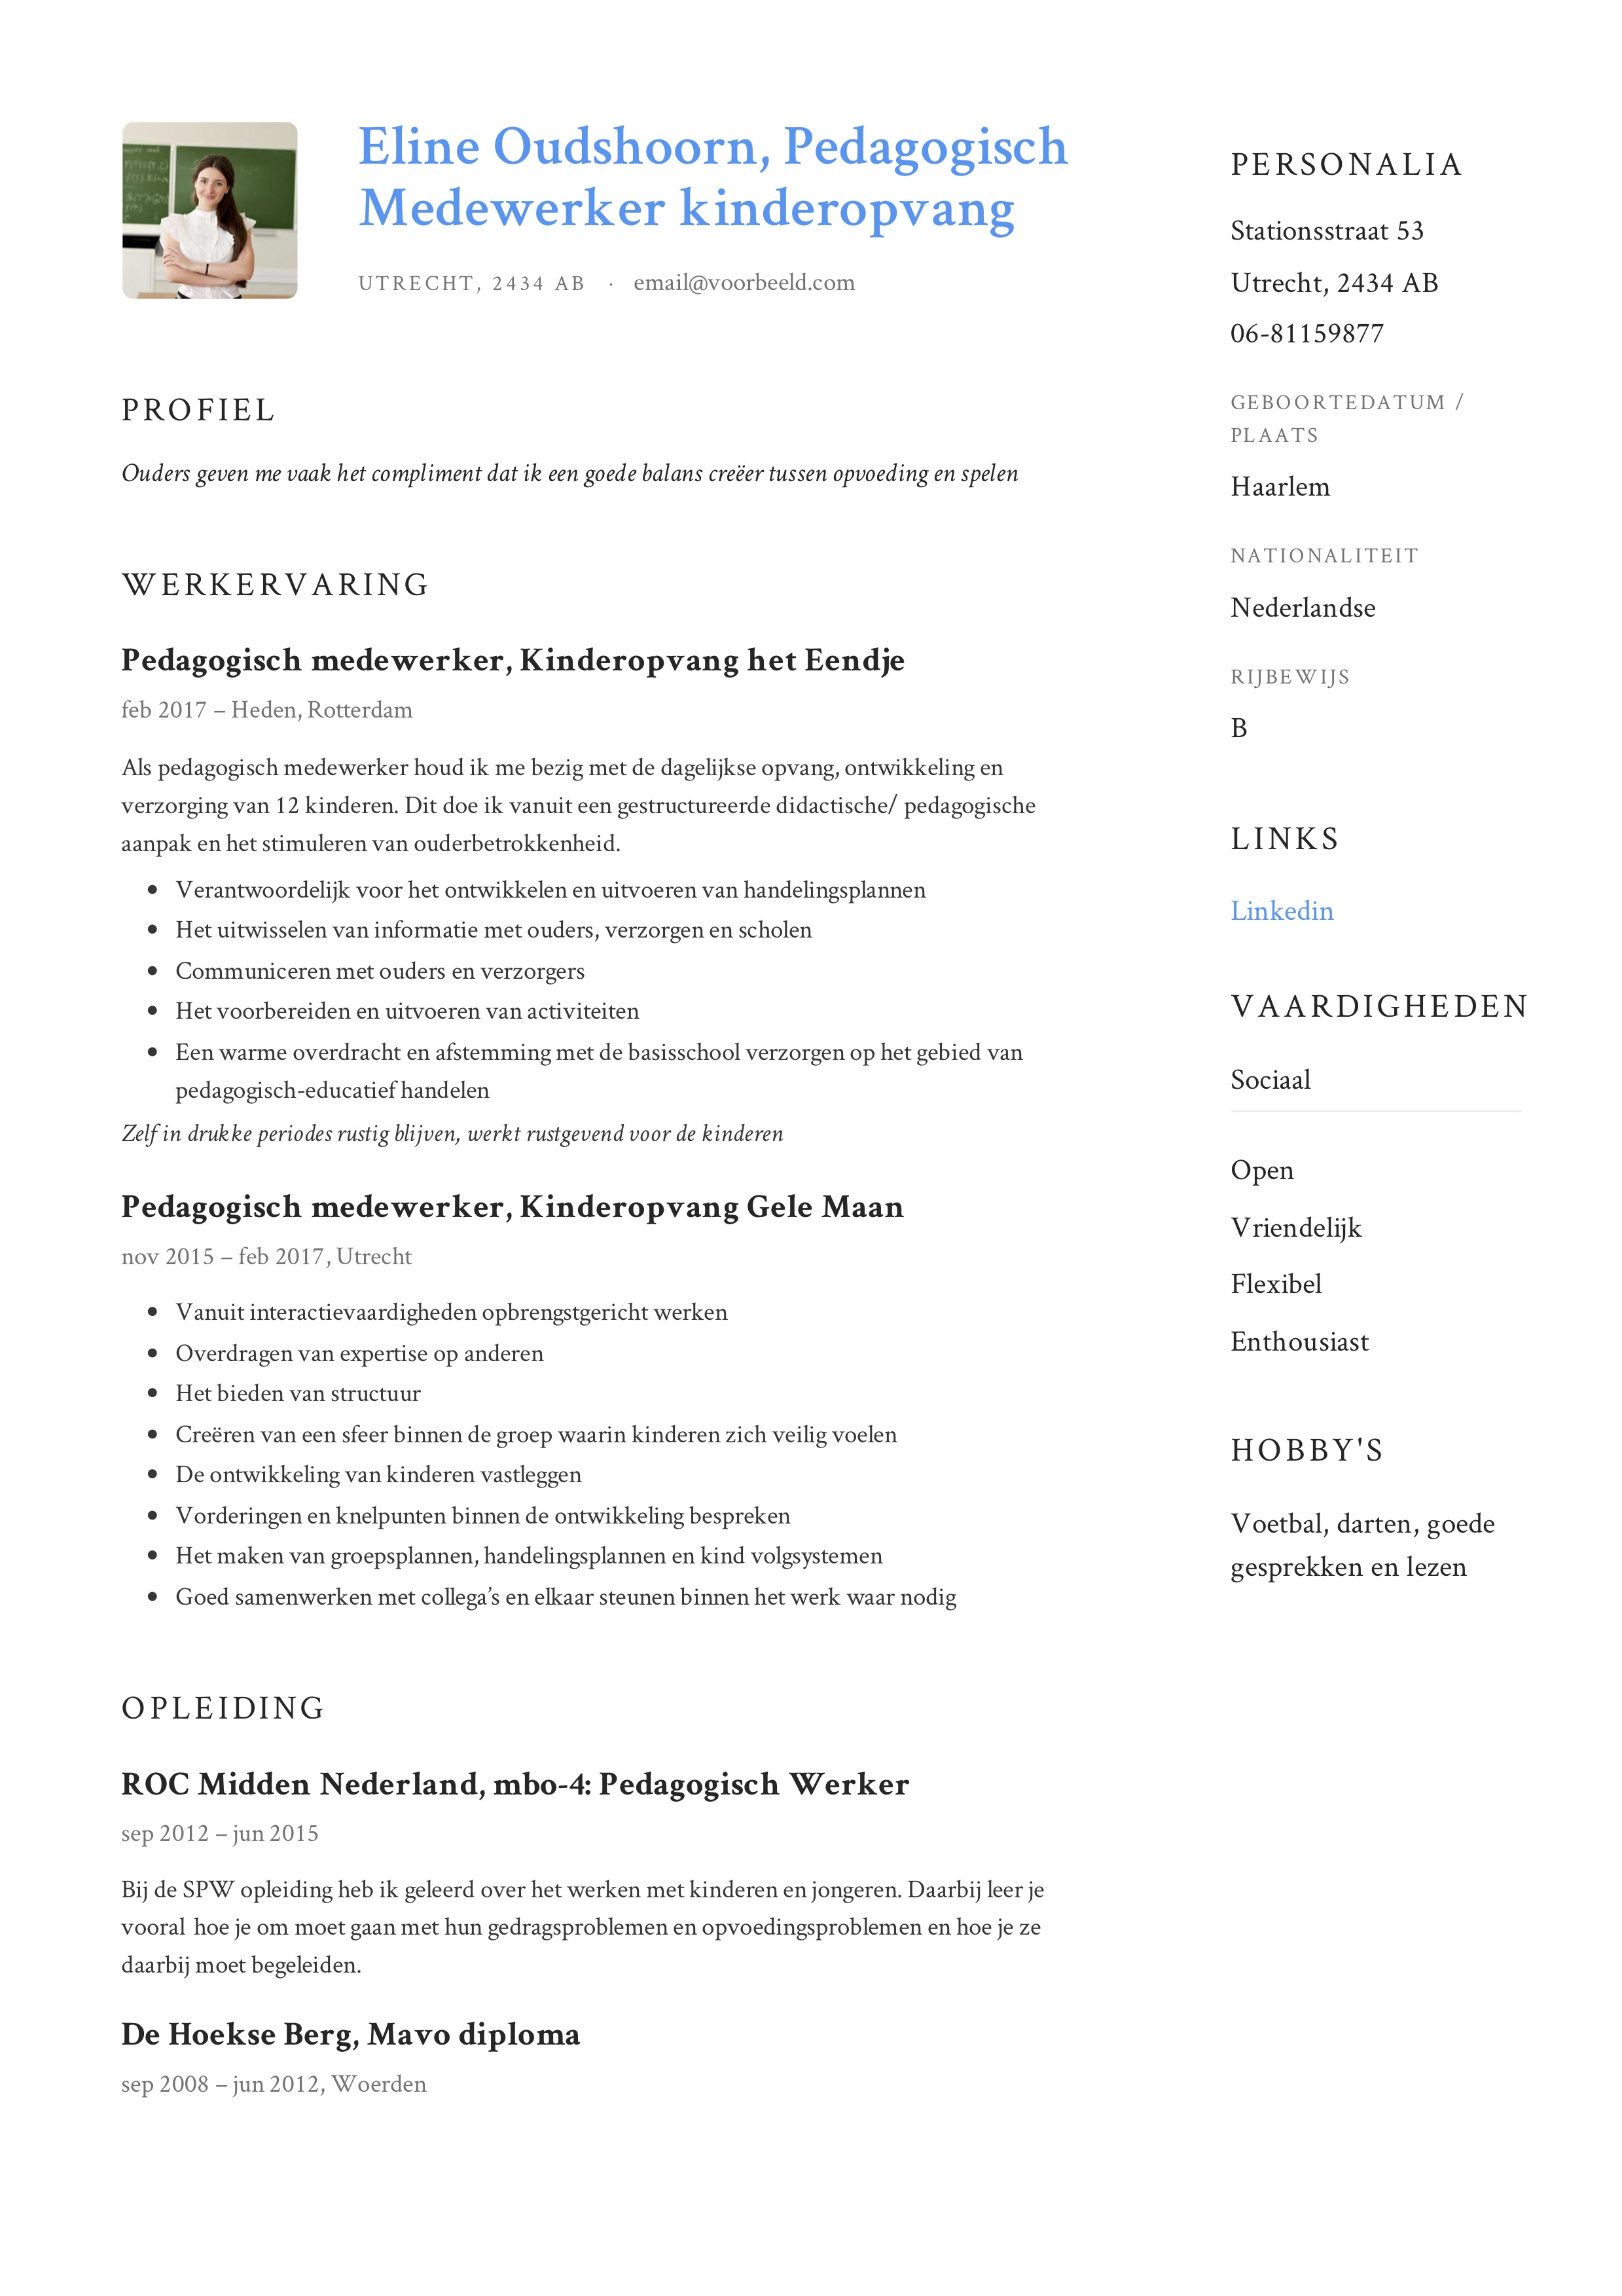 Eline_Oudshoorn_-_CV_-_Pedagogisch_Medewerker_kinderopvang (5)